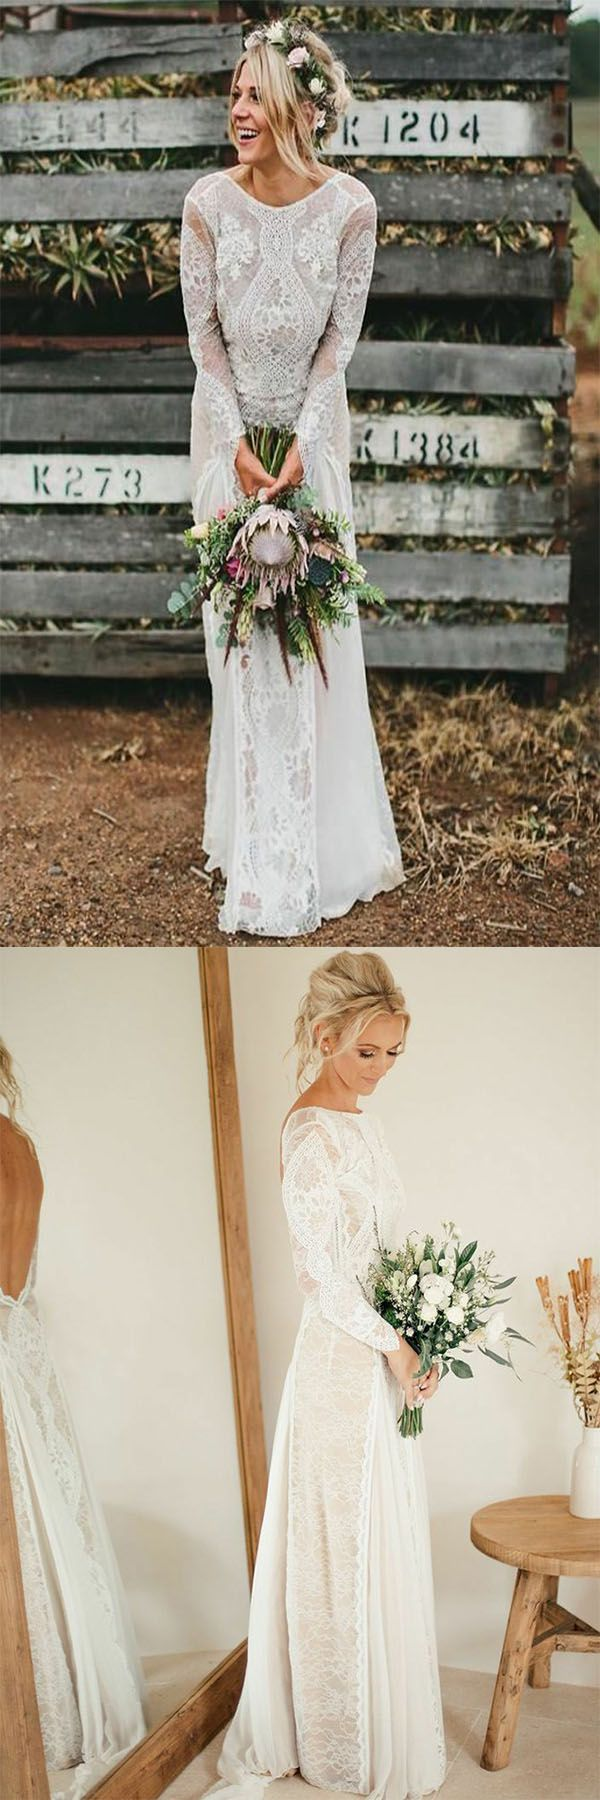 Aline bateau long sleeves backless chiffon wedding dress with lace